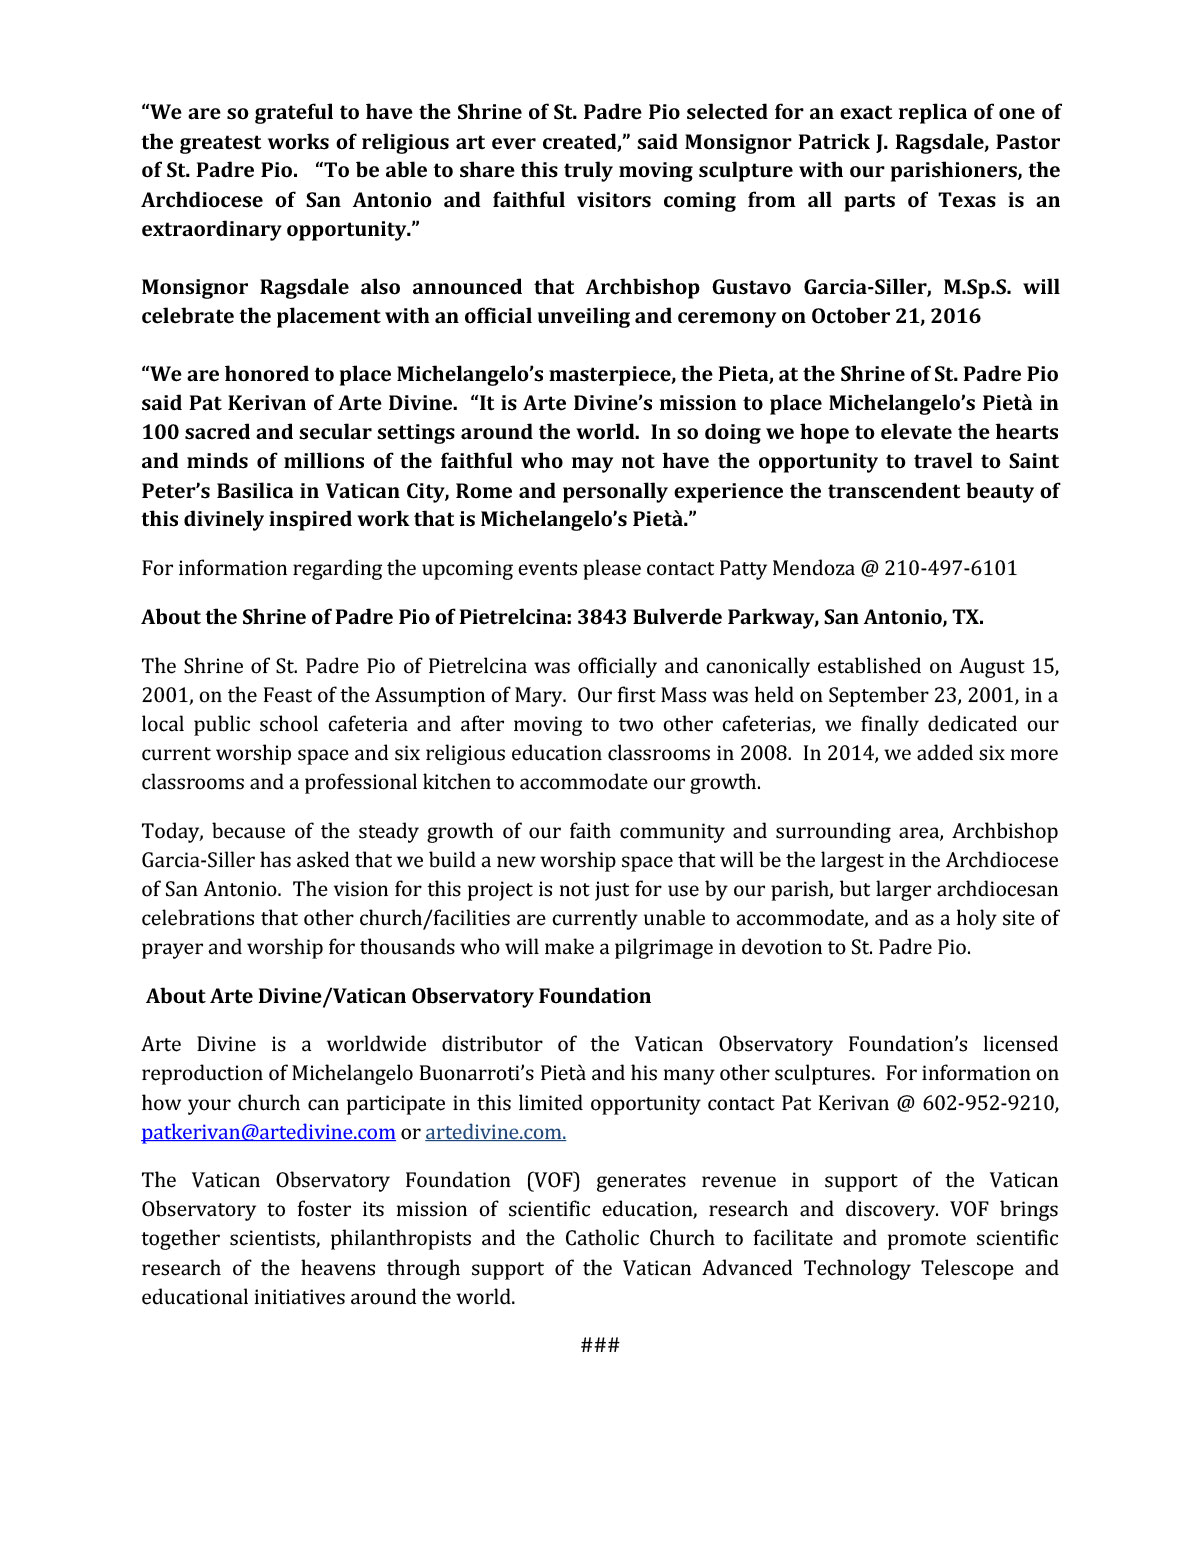 St Padre Pio Press Release-Oct 2016 2